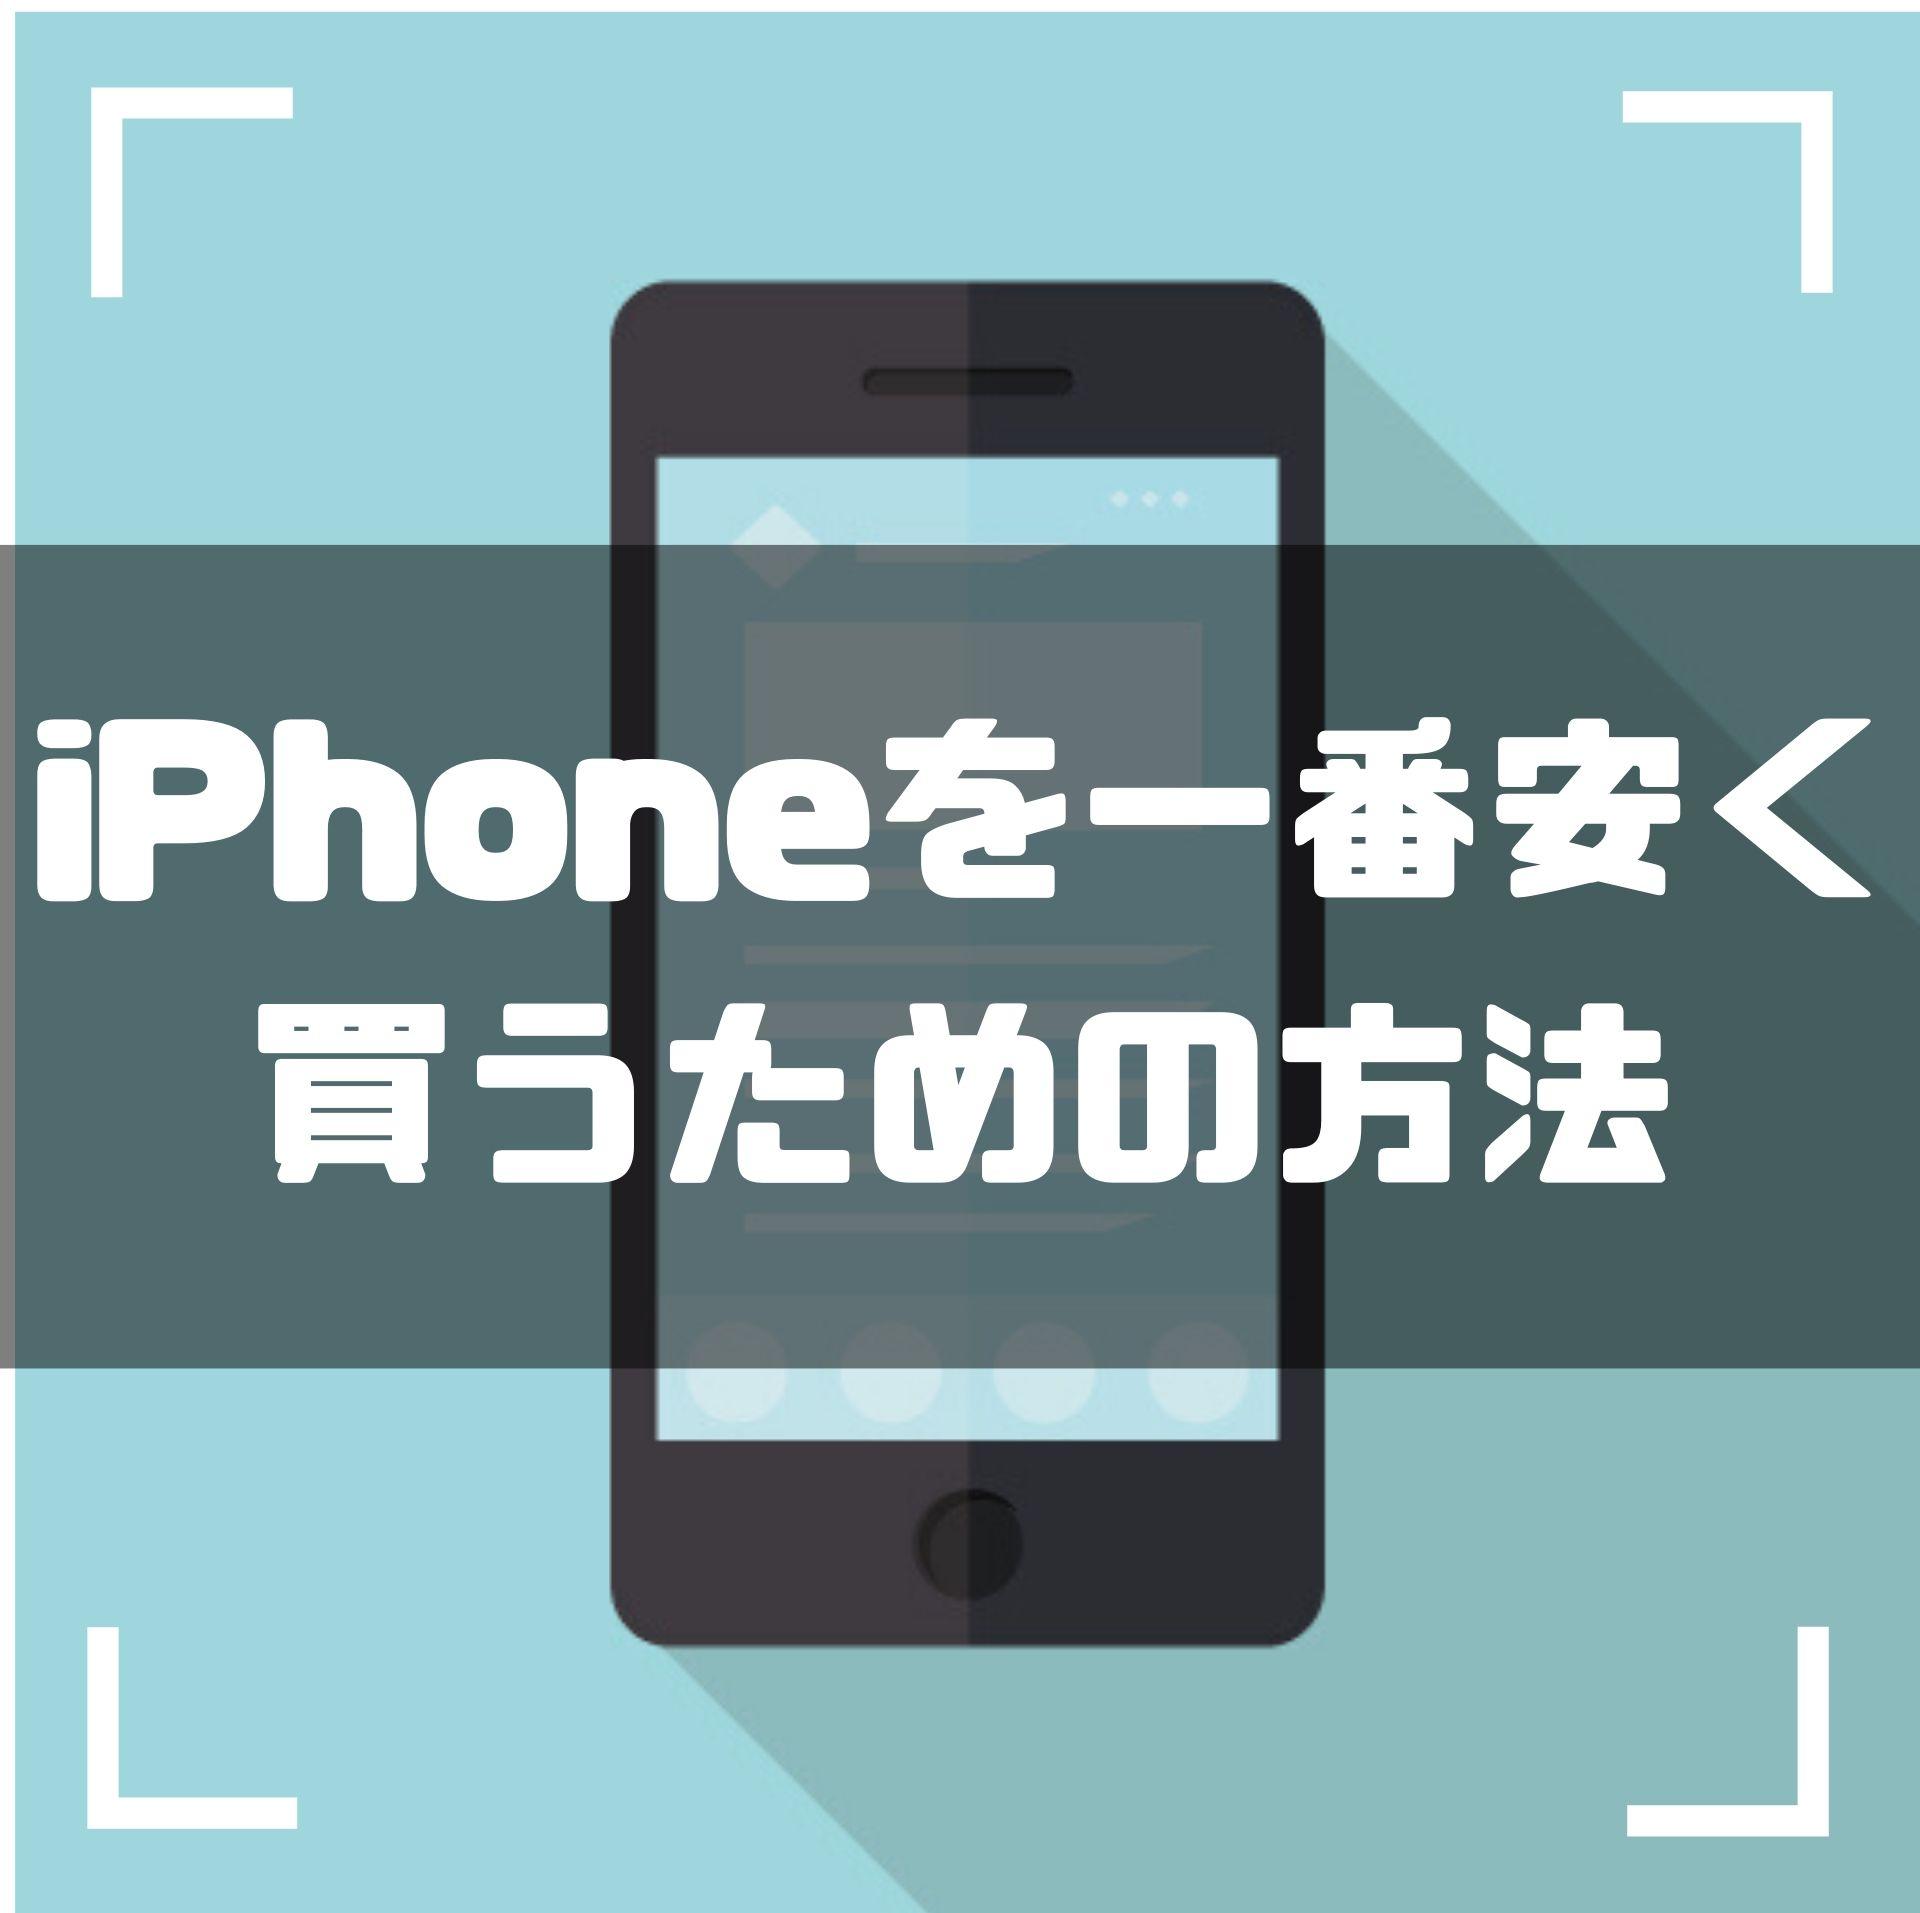 iPhoneを安く購入する方法は?docomoやauなどのキャリアで安く買う方法や格安SIMで安く使用する方法を徹底解説!